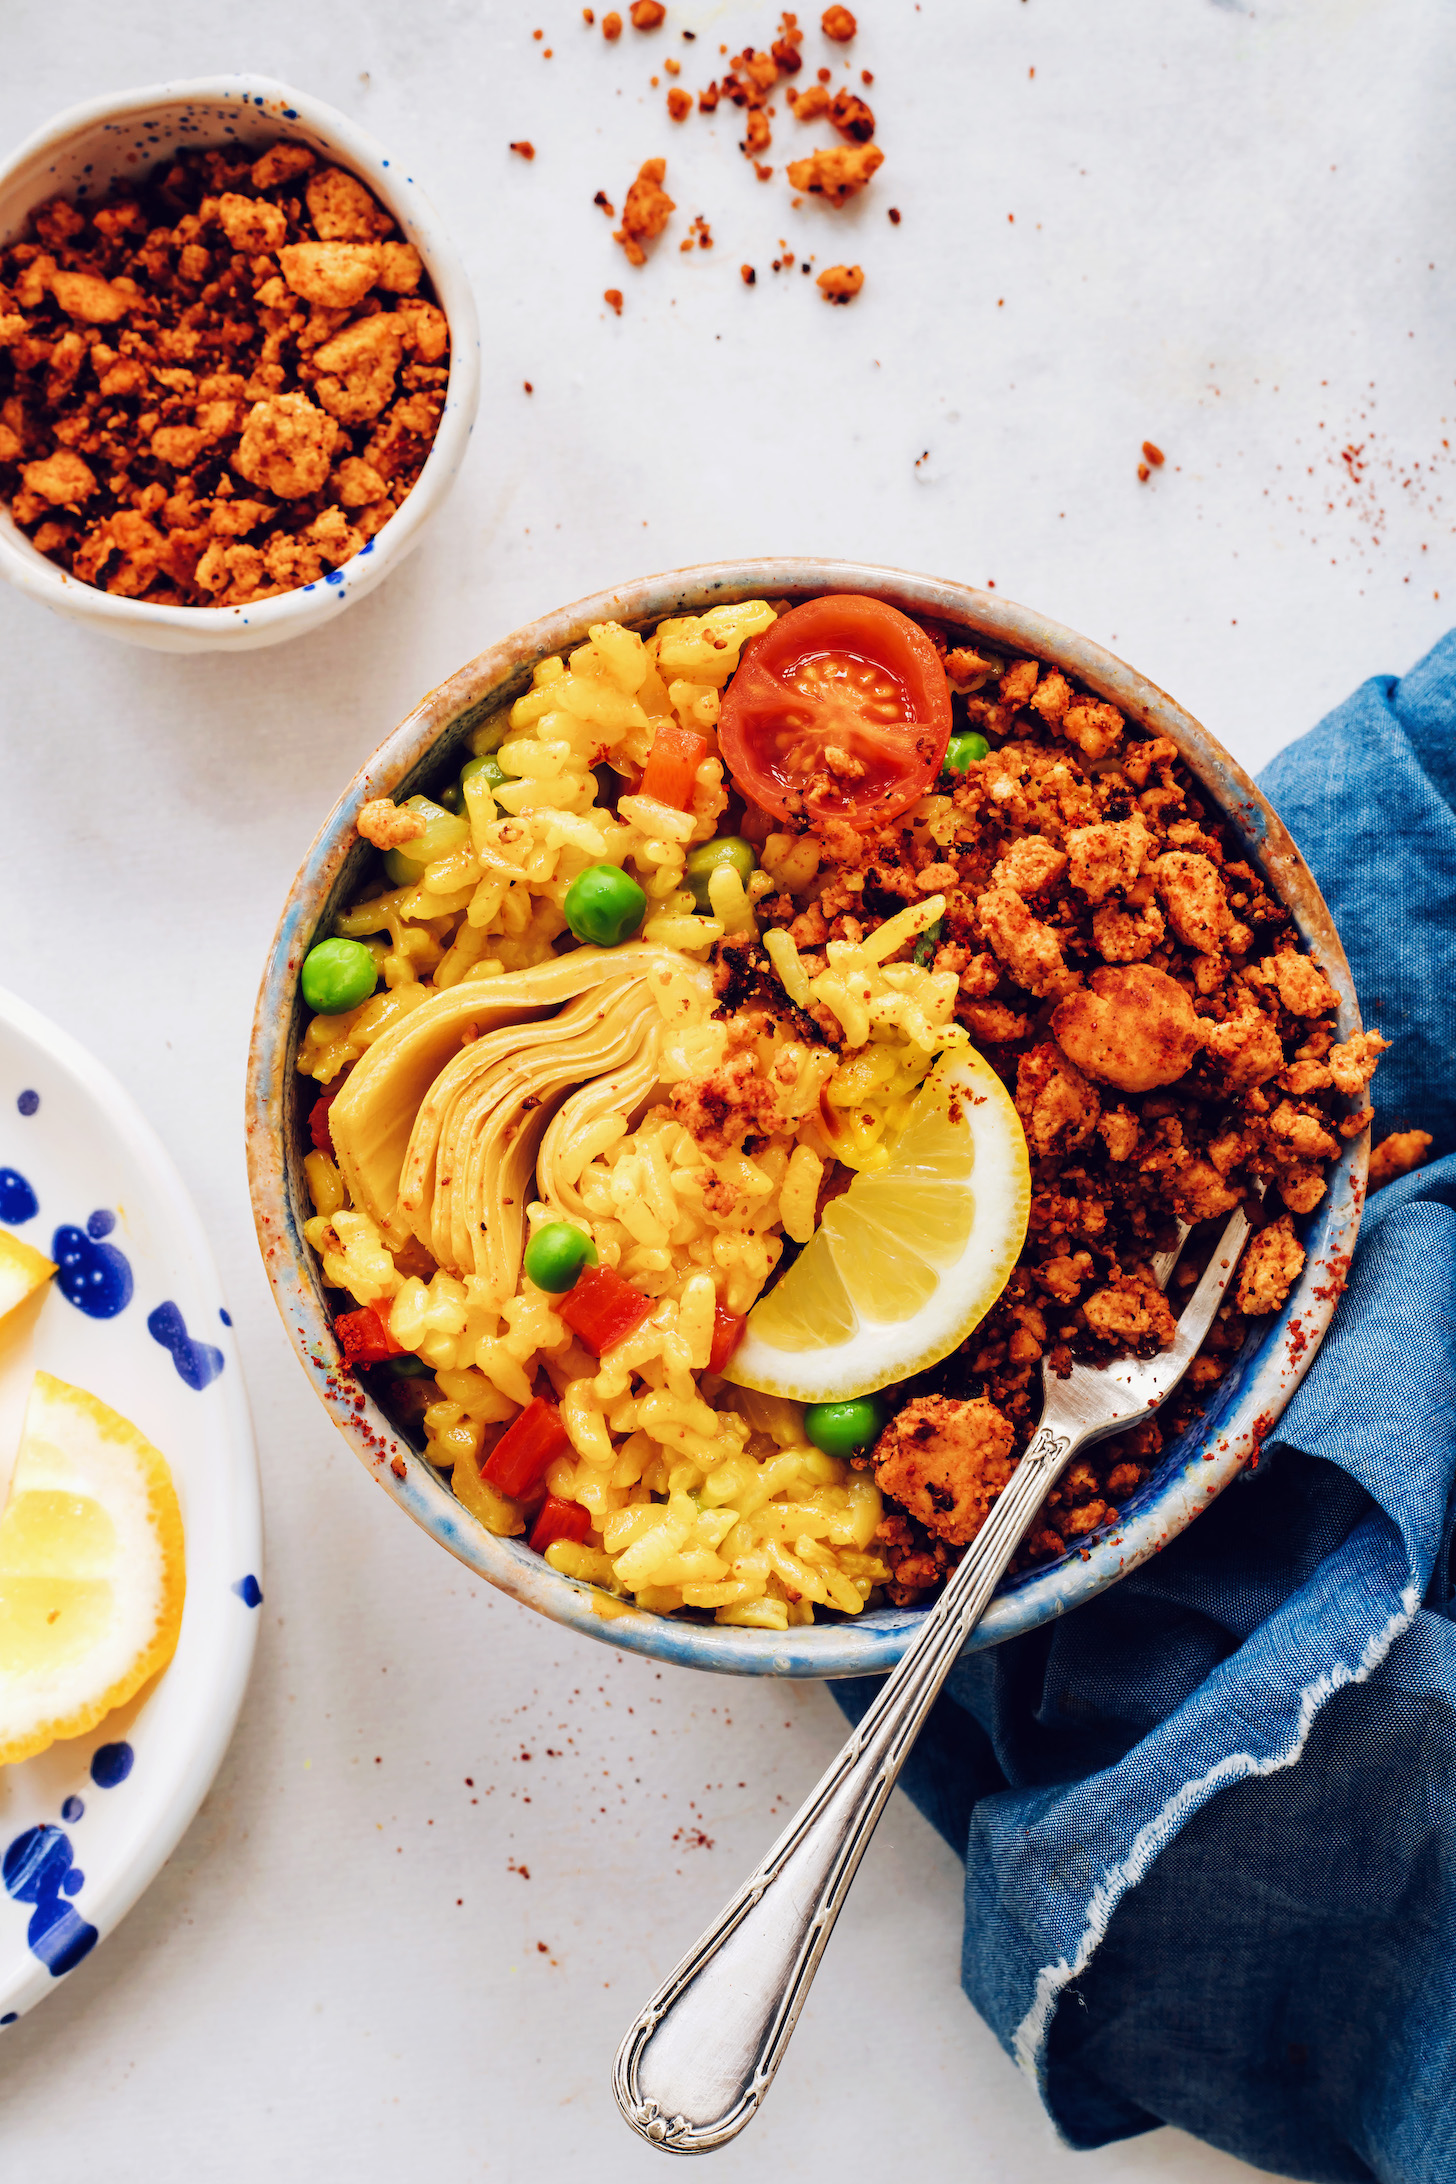 Bowl of vegan paella with tofu chorizo